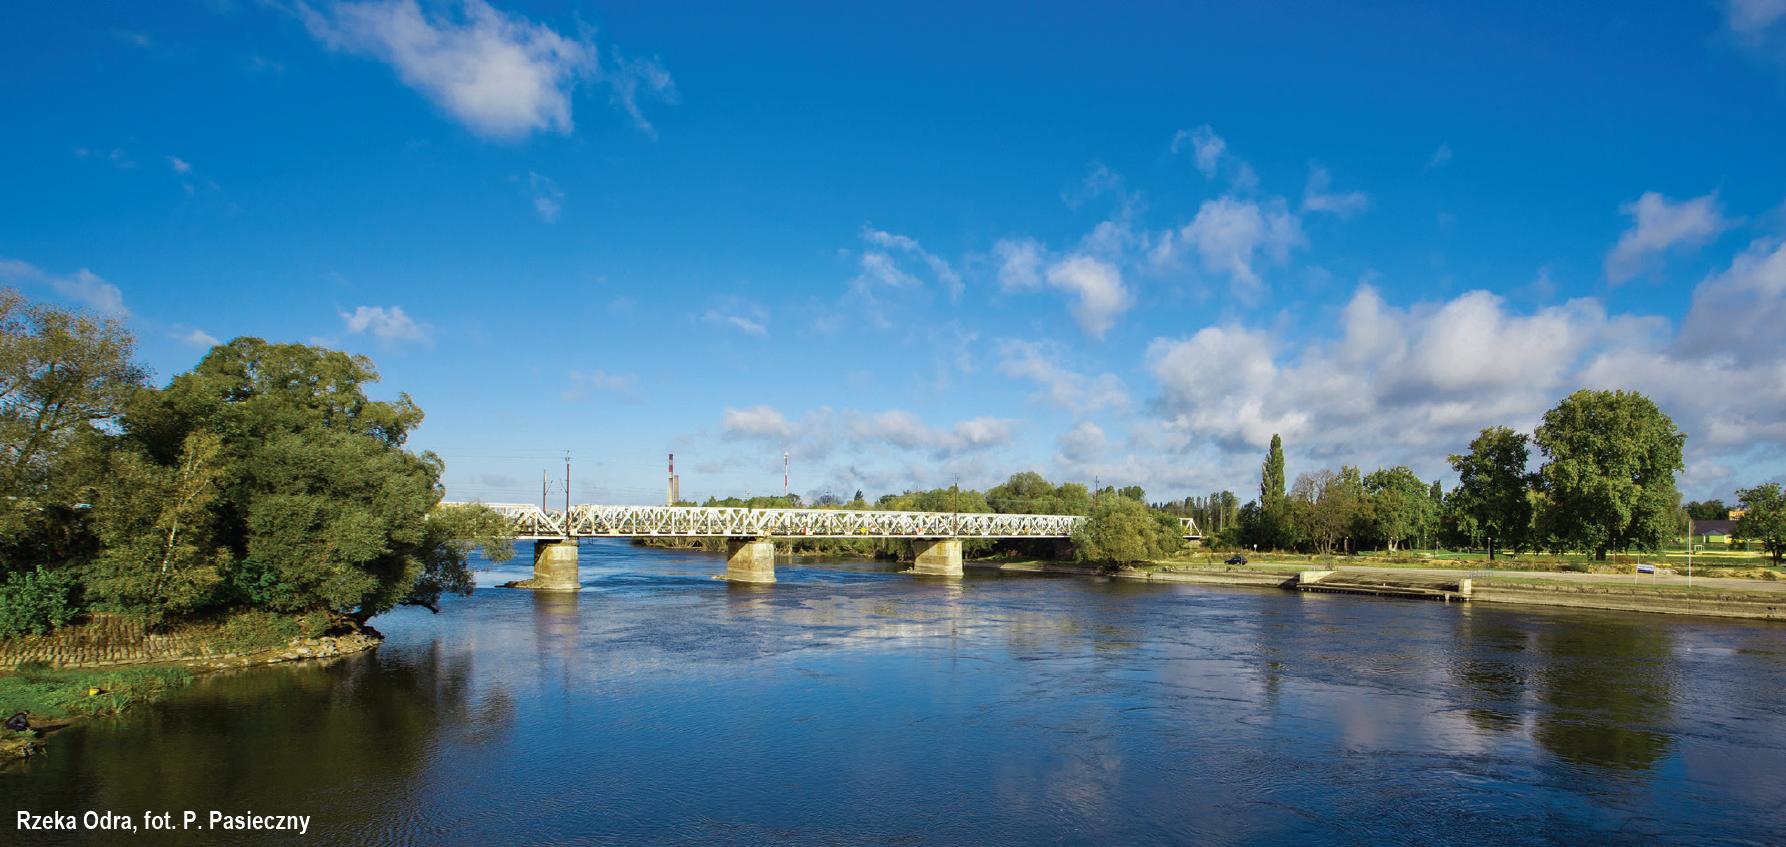 ODRA RIVER – TOURIST POTENTIAL